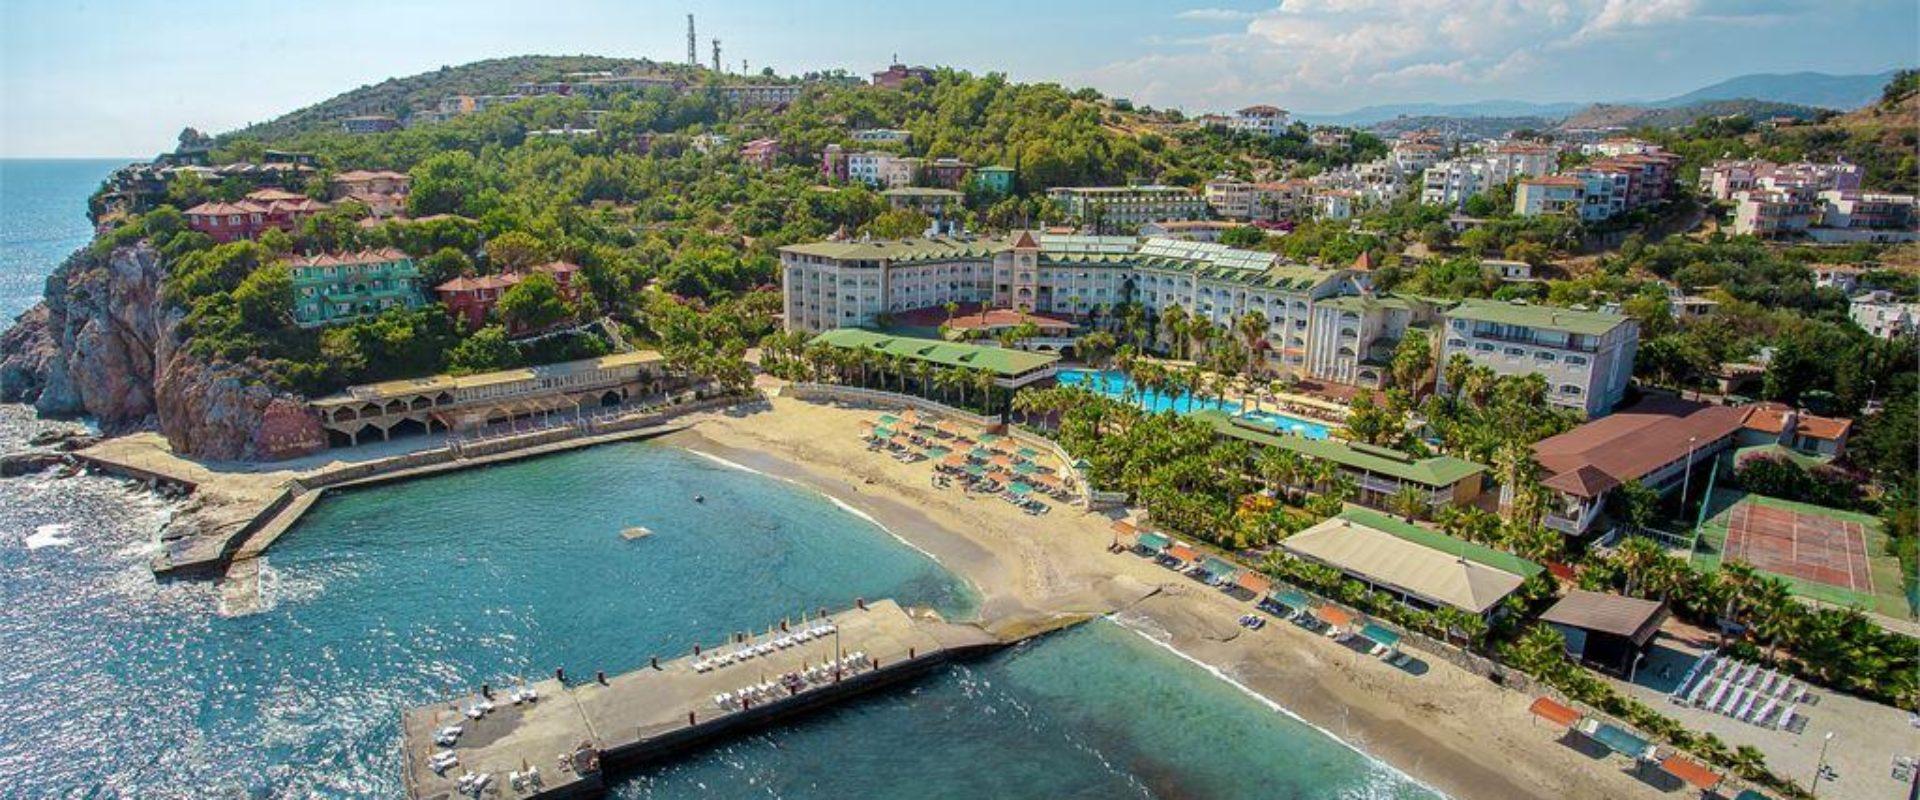 Odihnă în Turcia 2020, Alanya, Hotel Kemal Bay